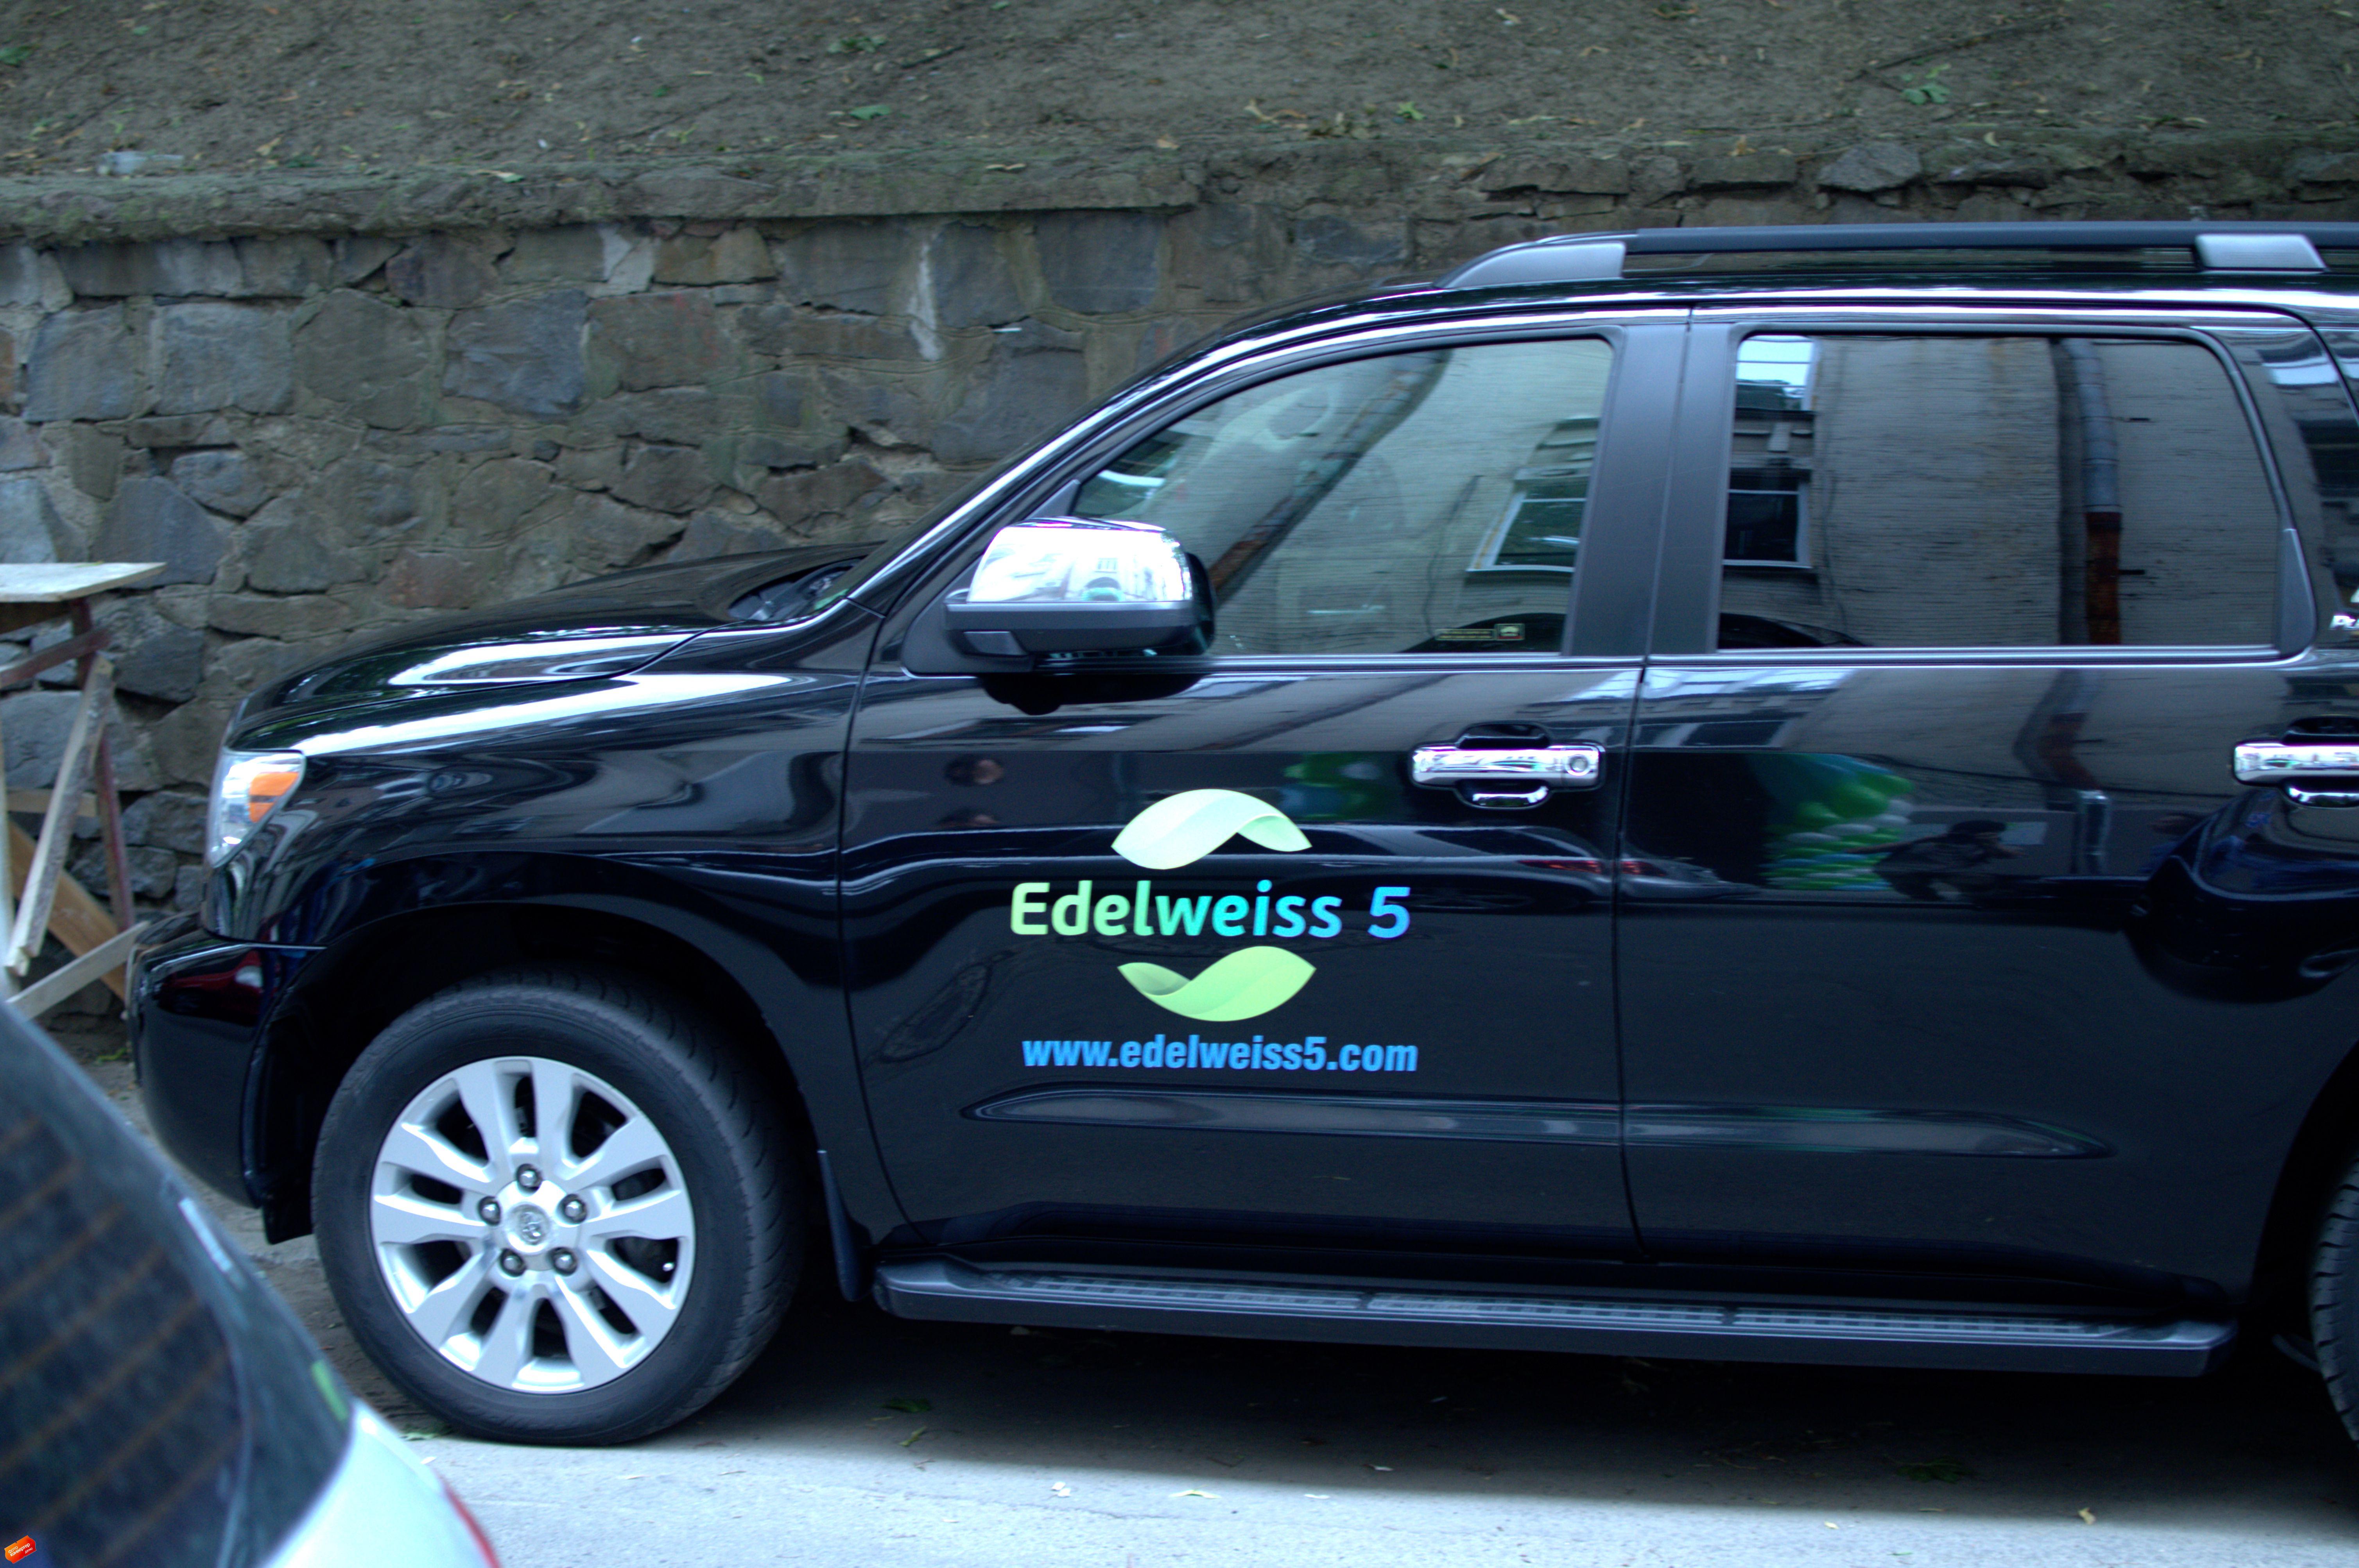 edelweiss 5 автомобиль